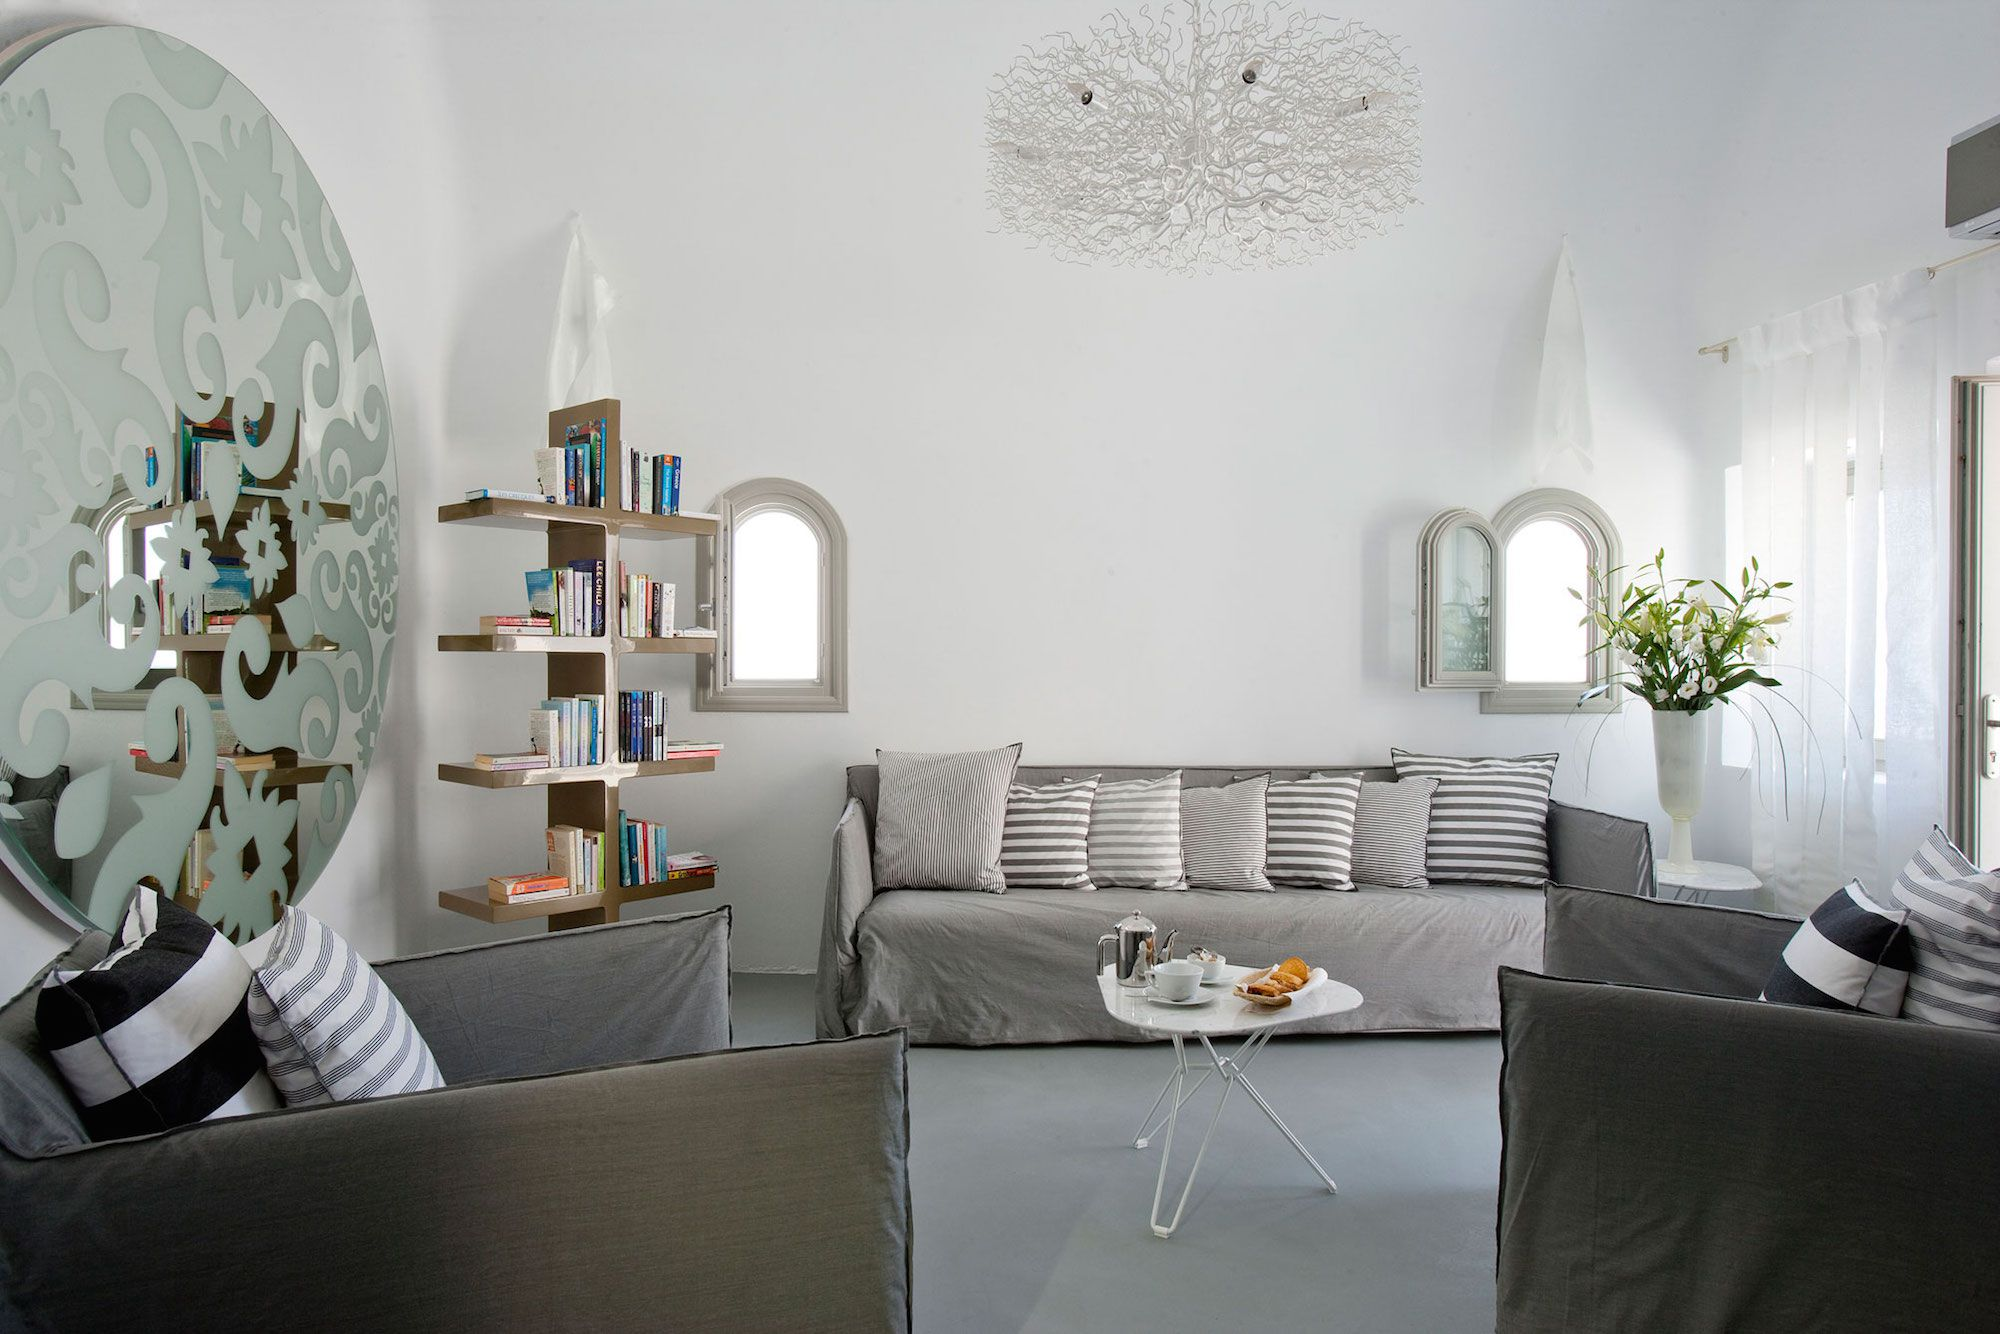 grace santorini hoteldivercity and mplusm architects